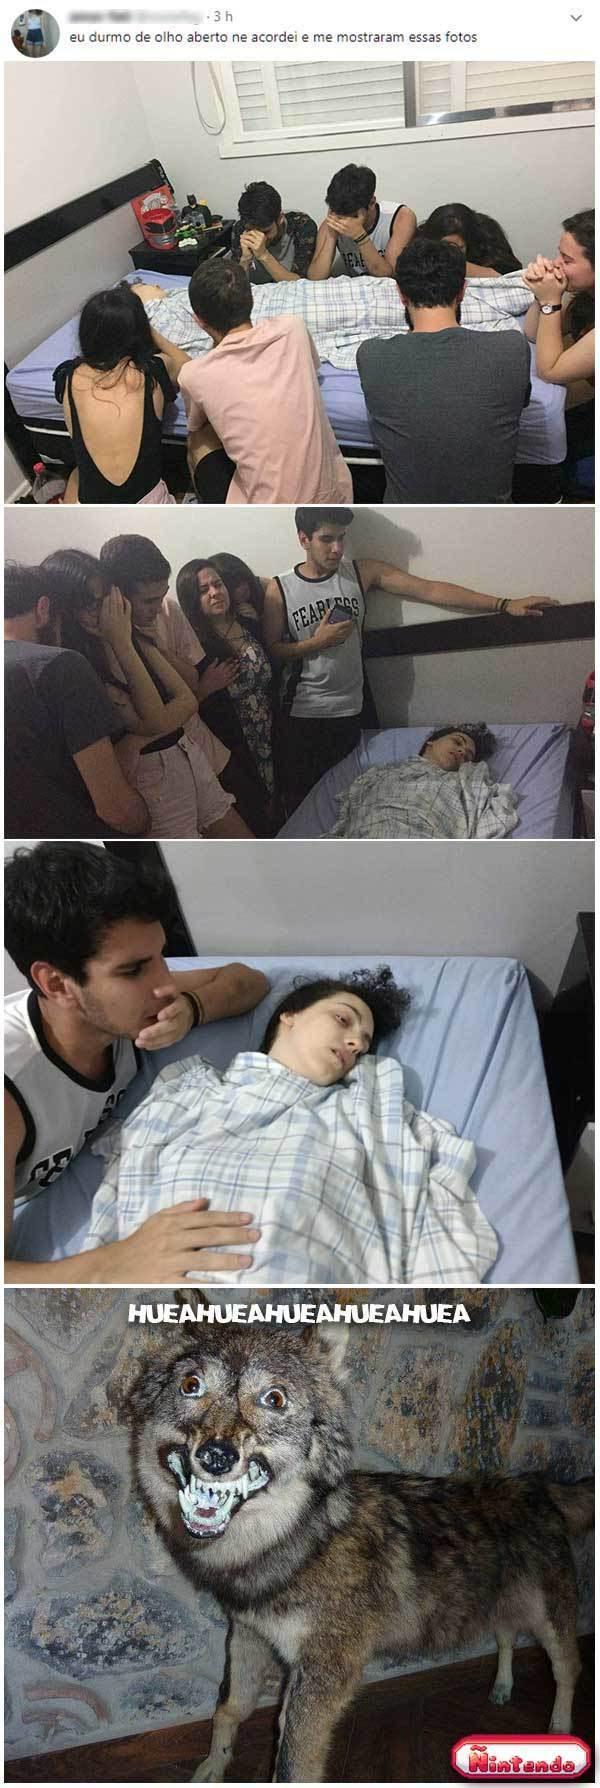 Tá Dormindo Ou Tá Morta?